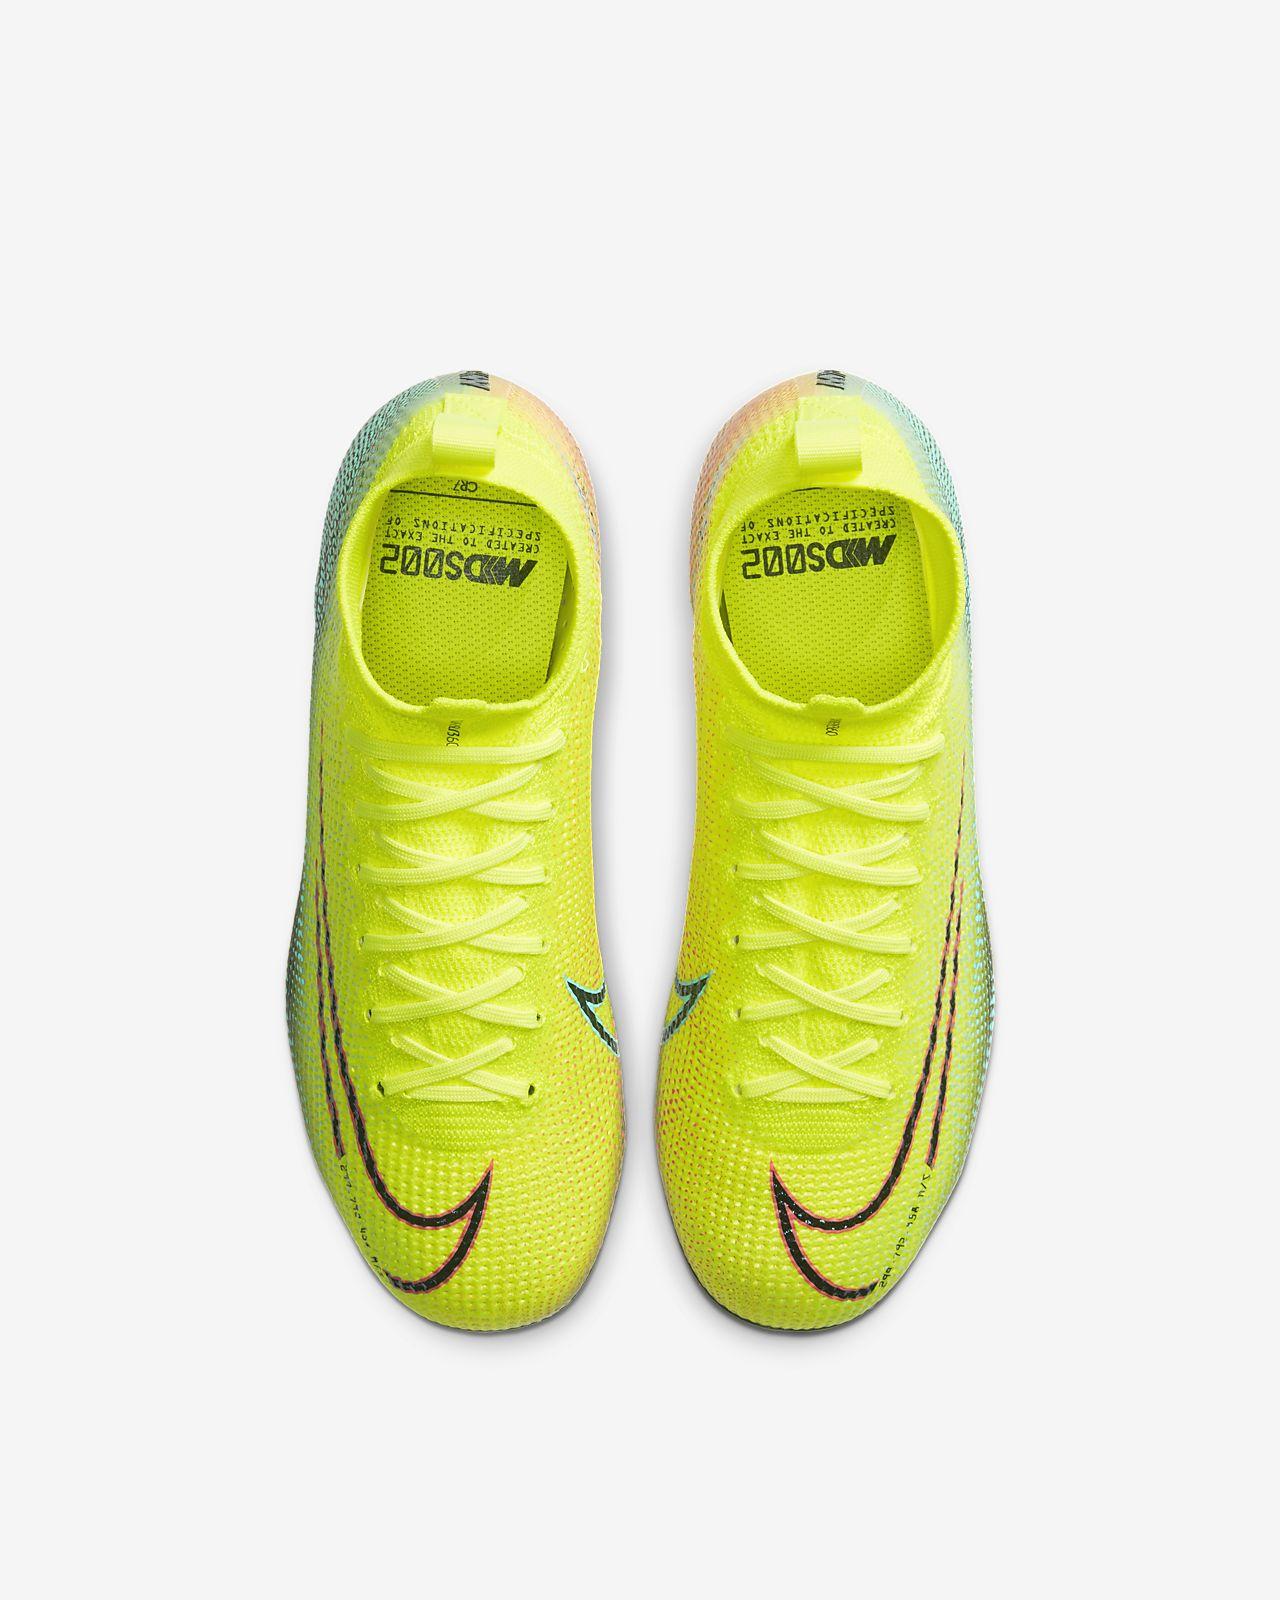 Nike Jr. Mercurial Superfly 7 Elite MDS FG Older Kids' Firm Ground Football Boot